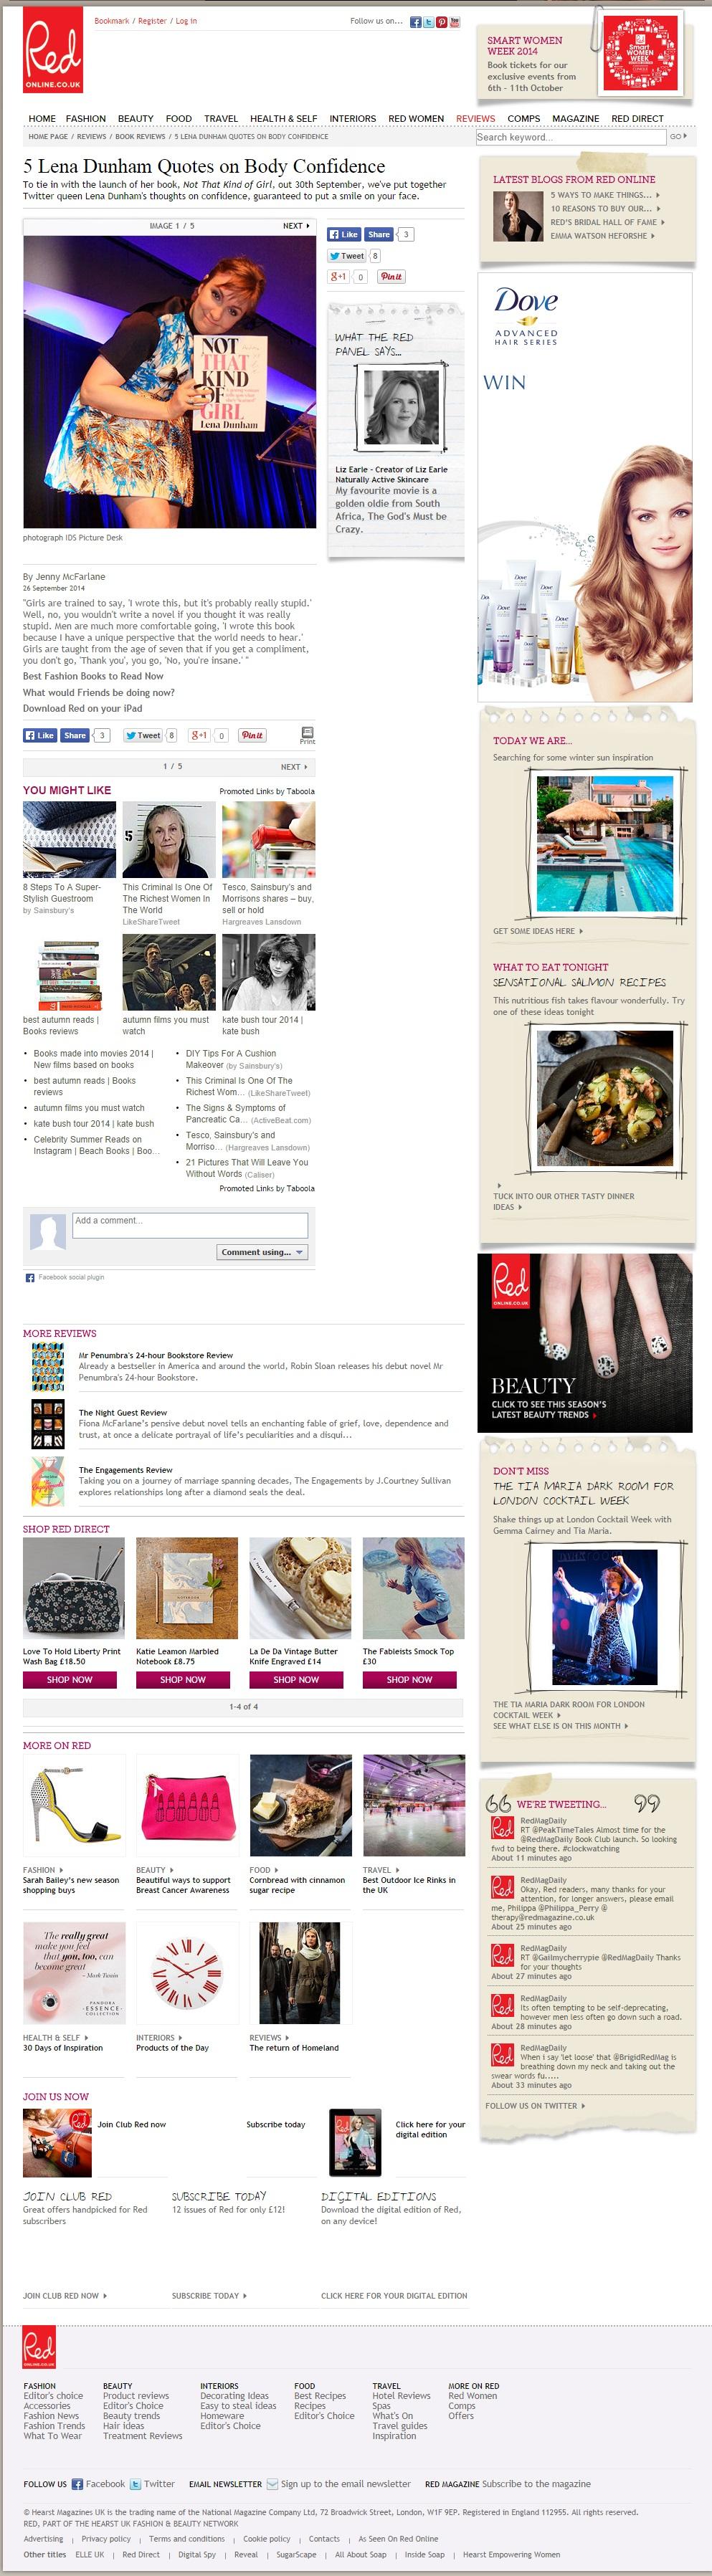 screencapture-www-redonline-co-uk-reviews-book-reviews-best-lena-dunham-quotes